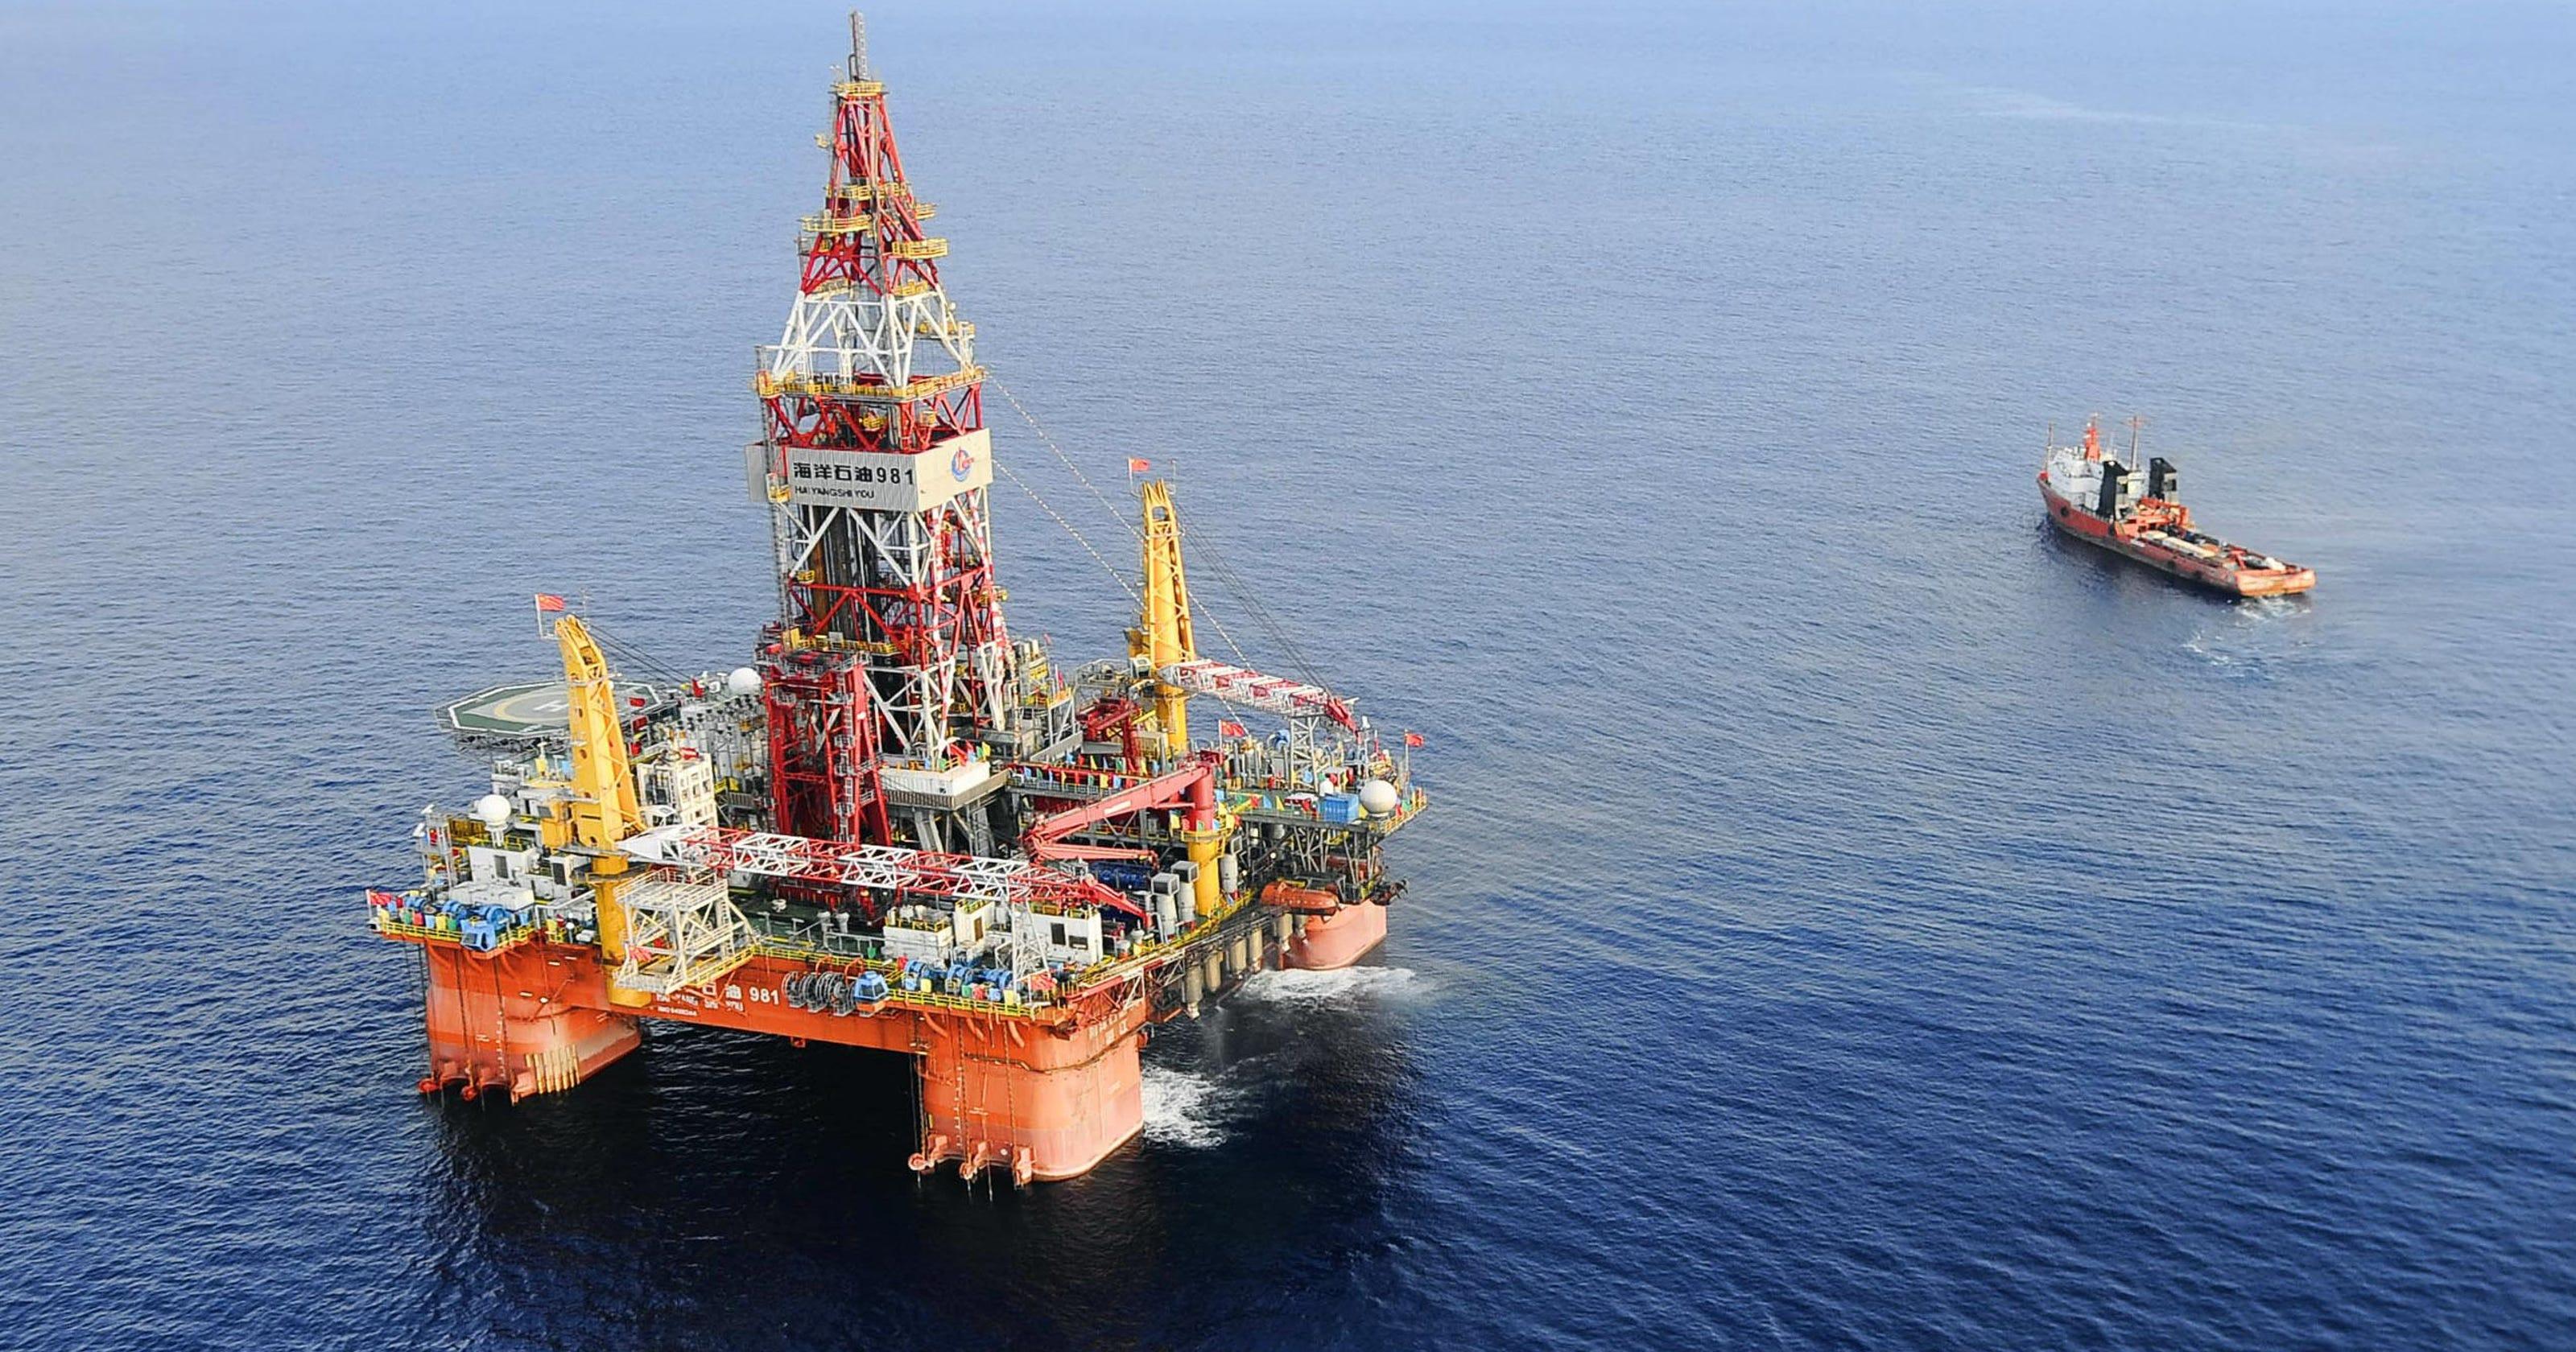 Atlantic offshore drilling: Will it help or hurt NJ?